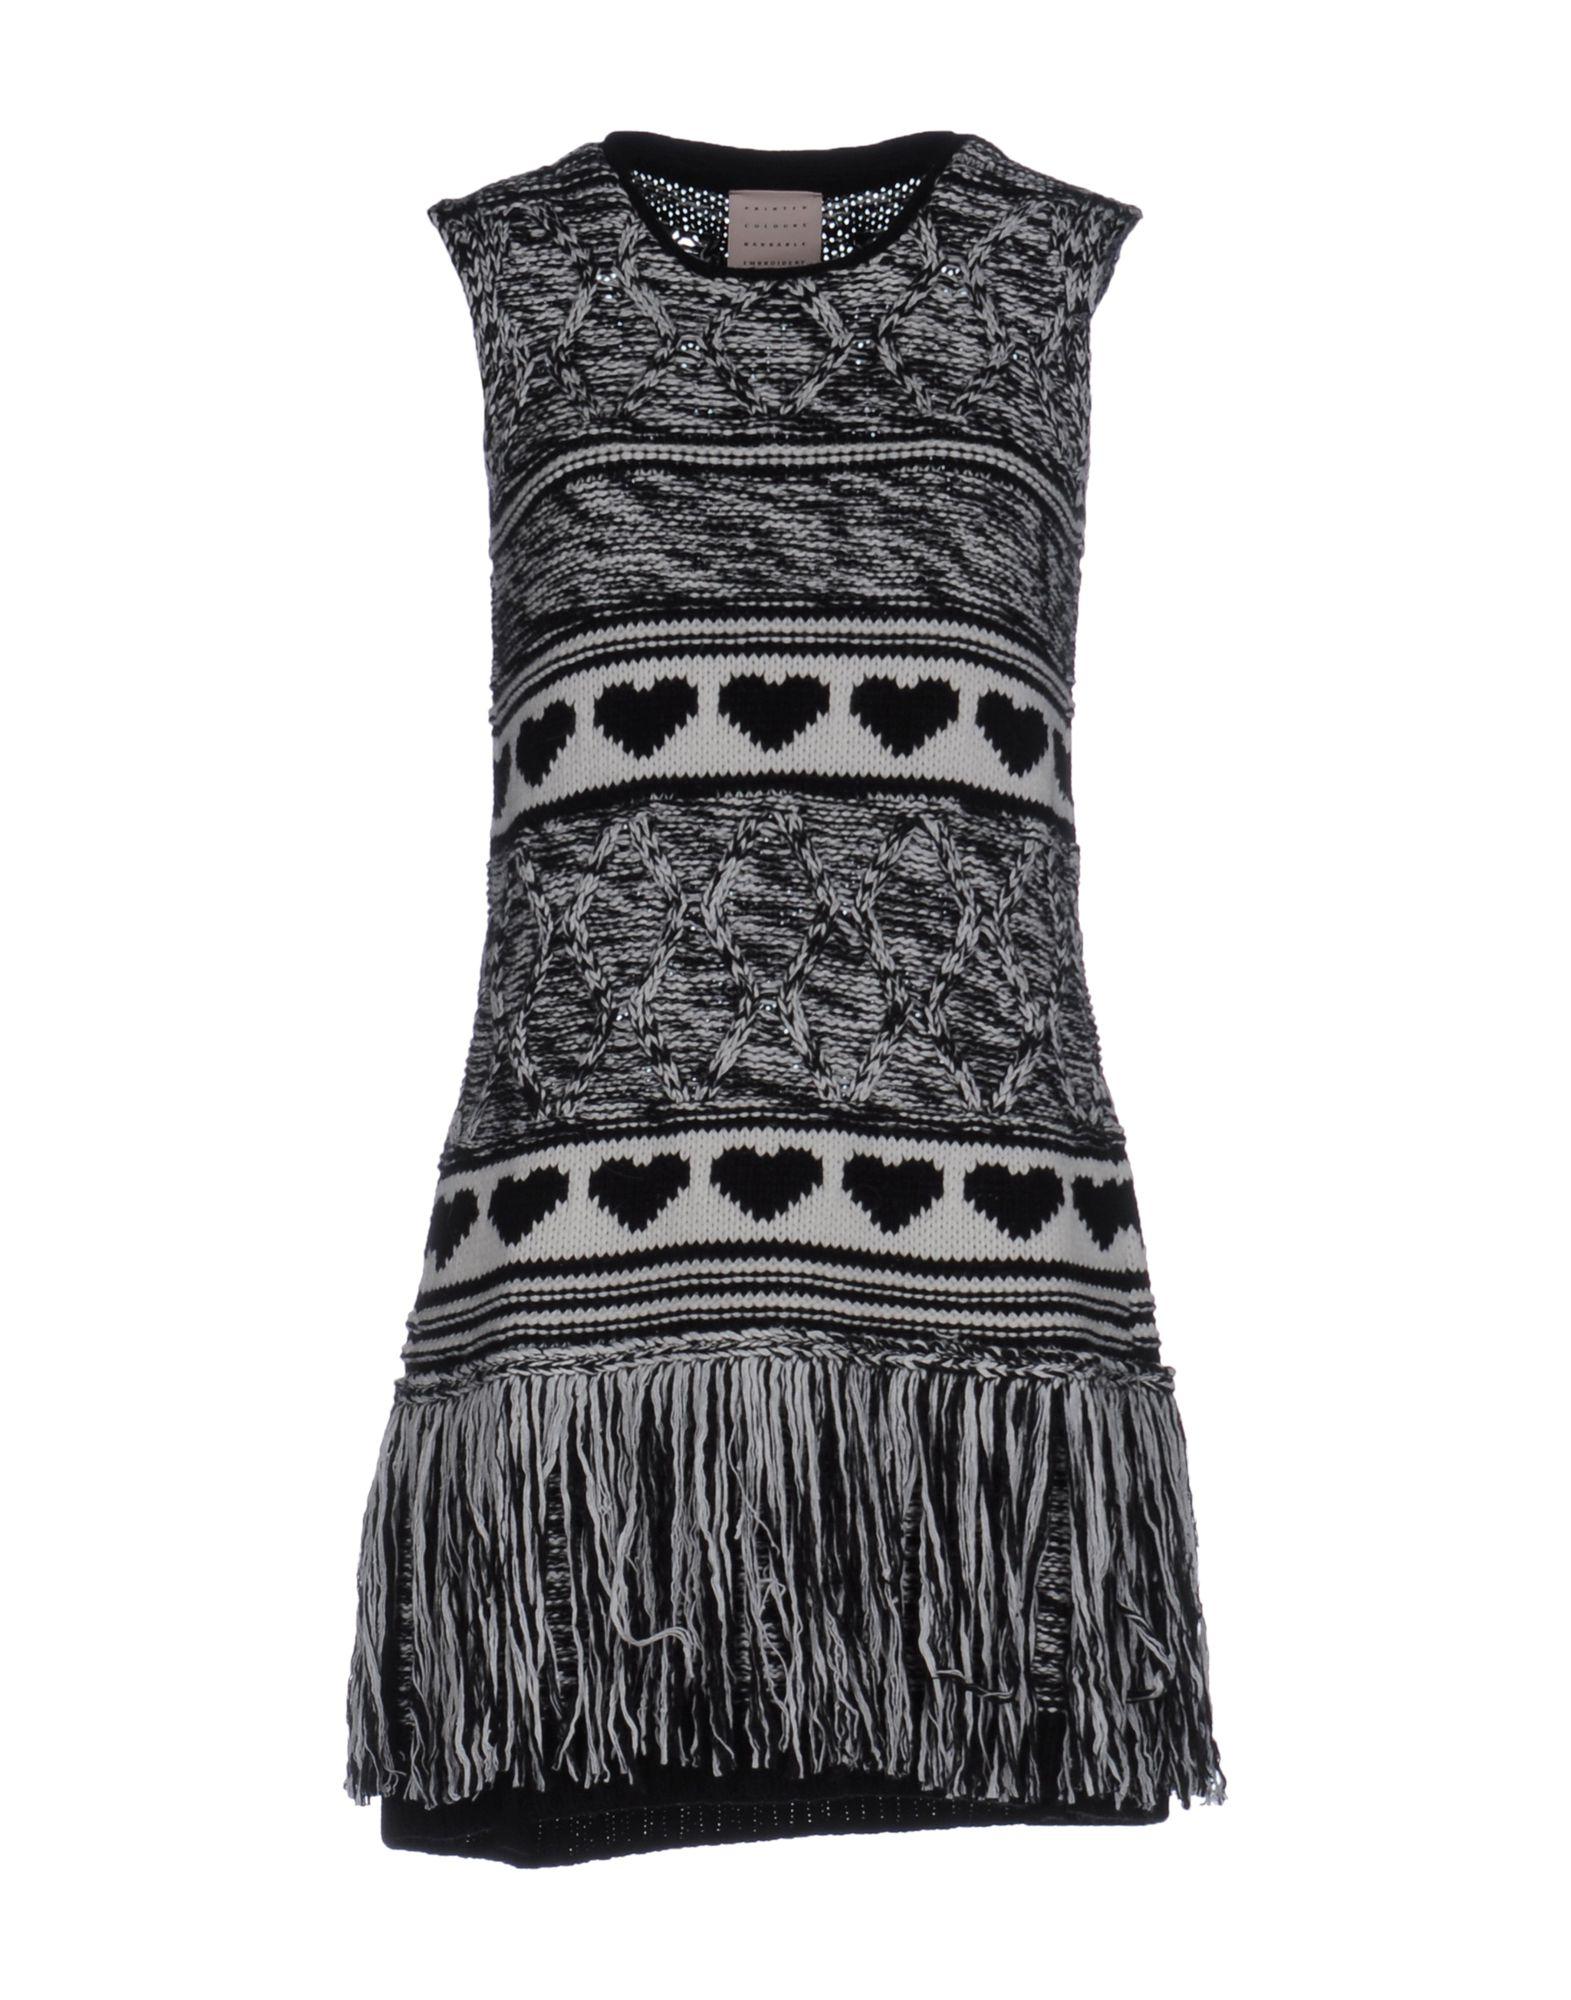 RARY Damen Kurzes Kleid Farbe Schwarz Größe 5